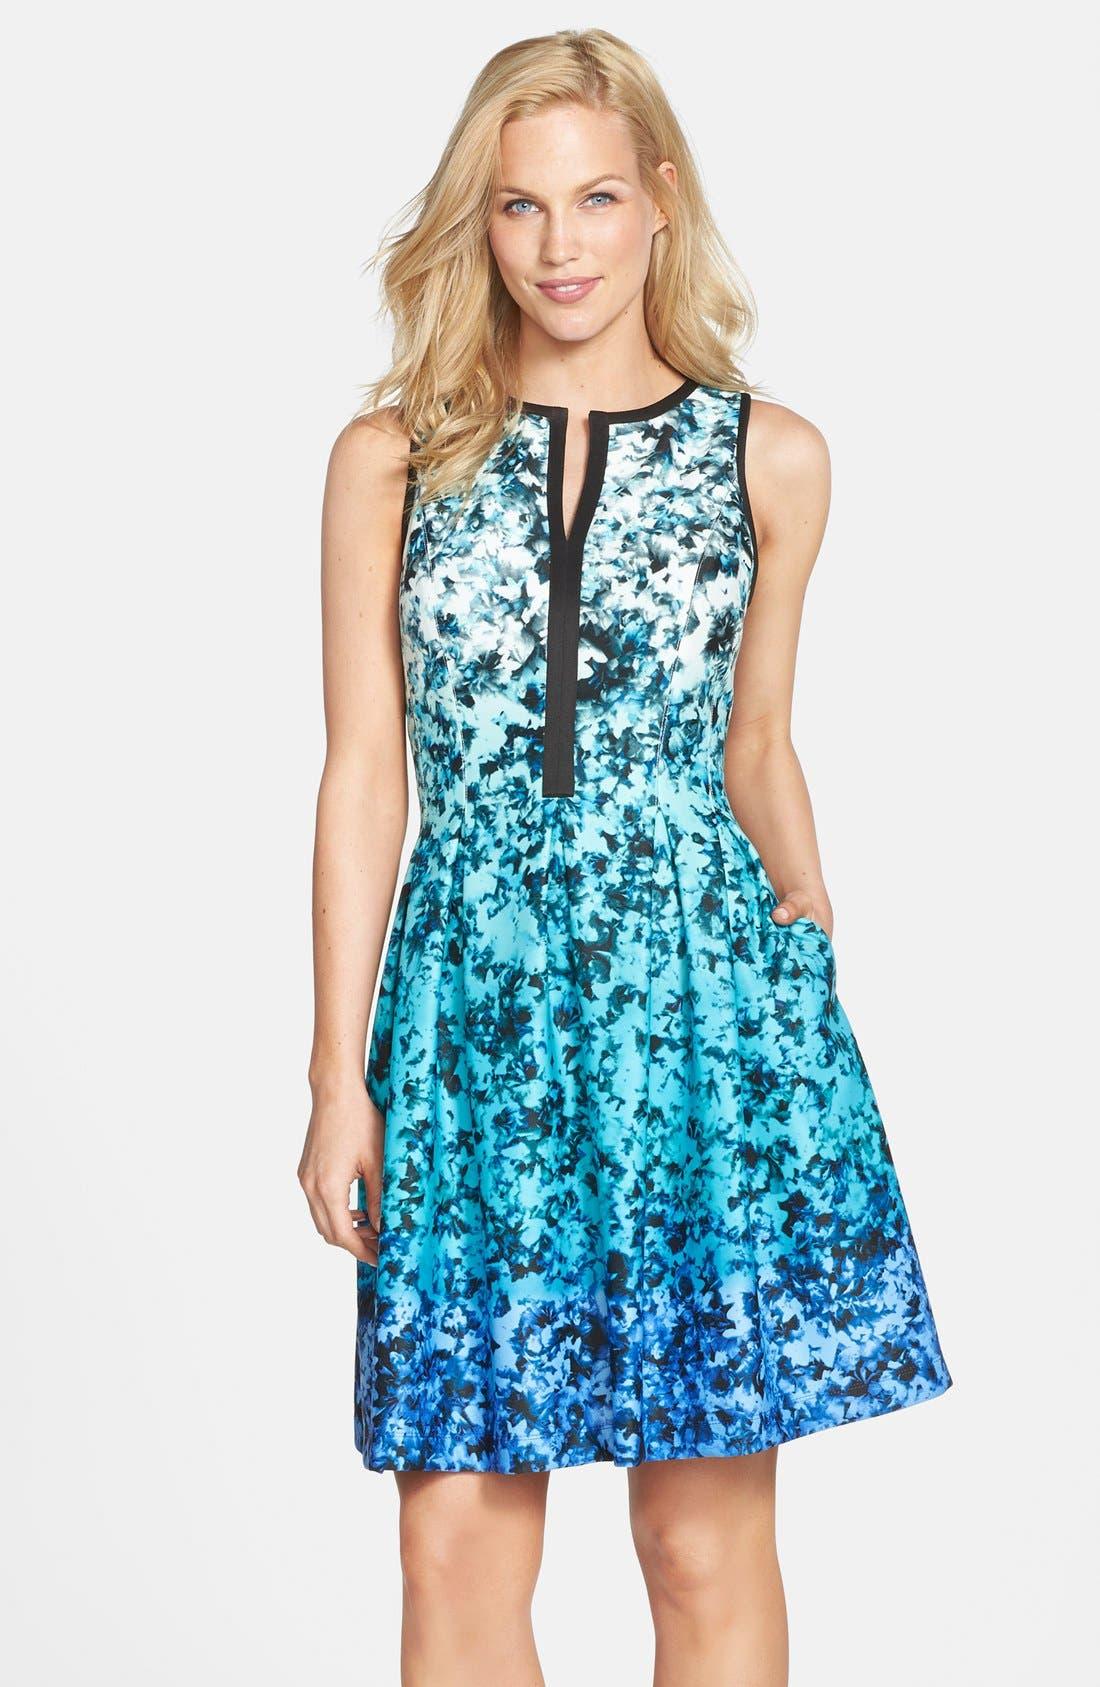 Main Image - Vince Camuto Ombré Floral Print Sleeveless Fit & Flare Dress (Regular & Petite)